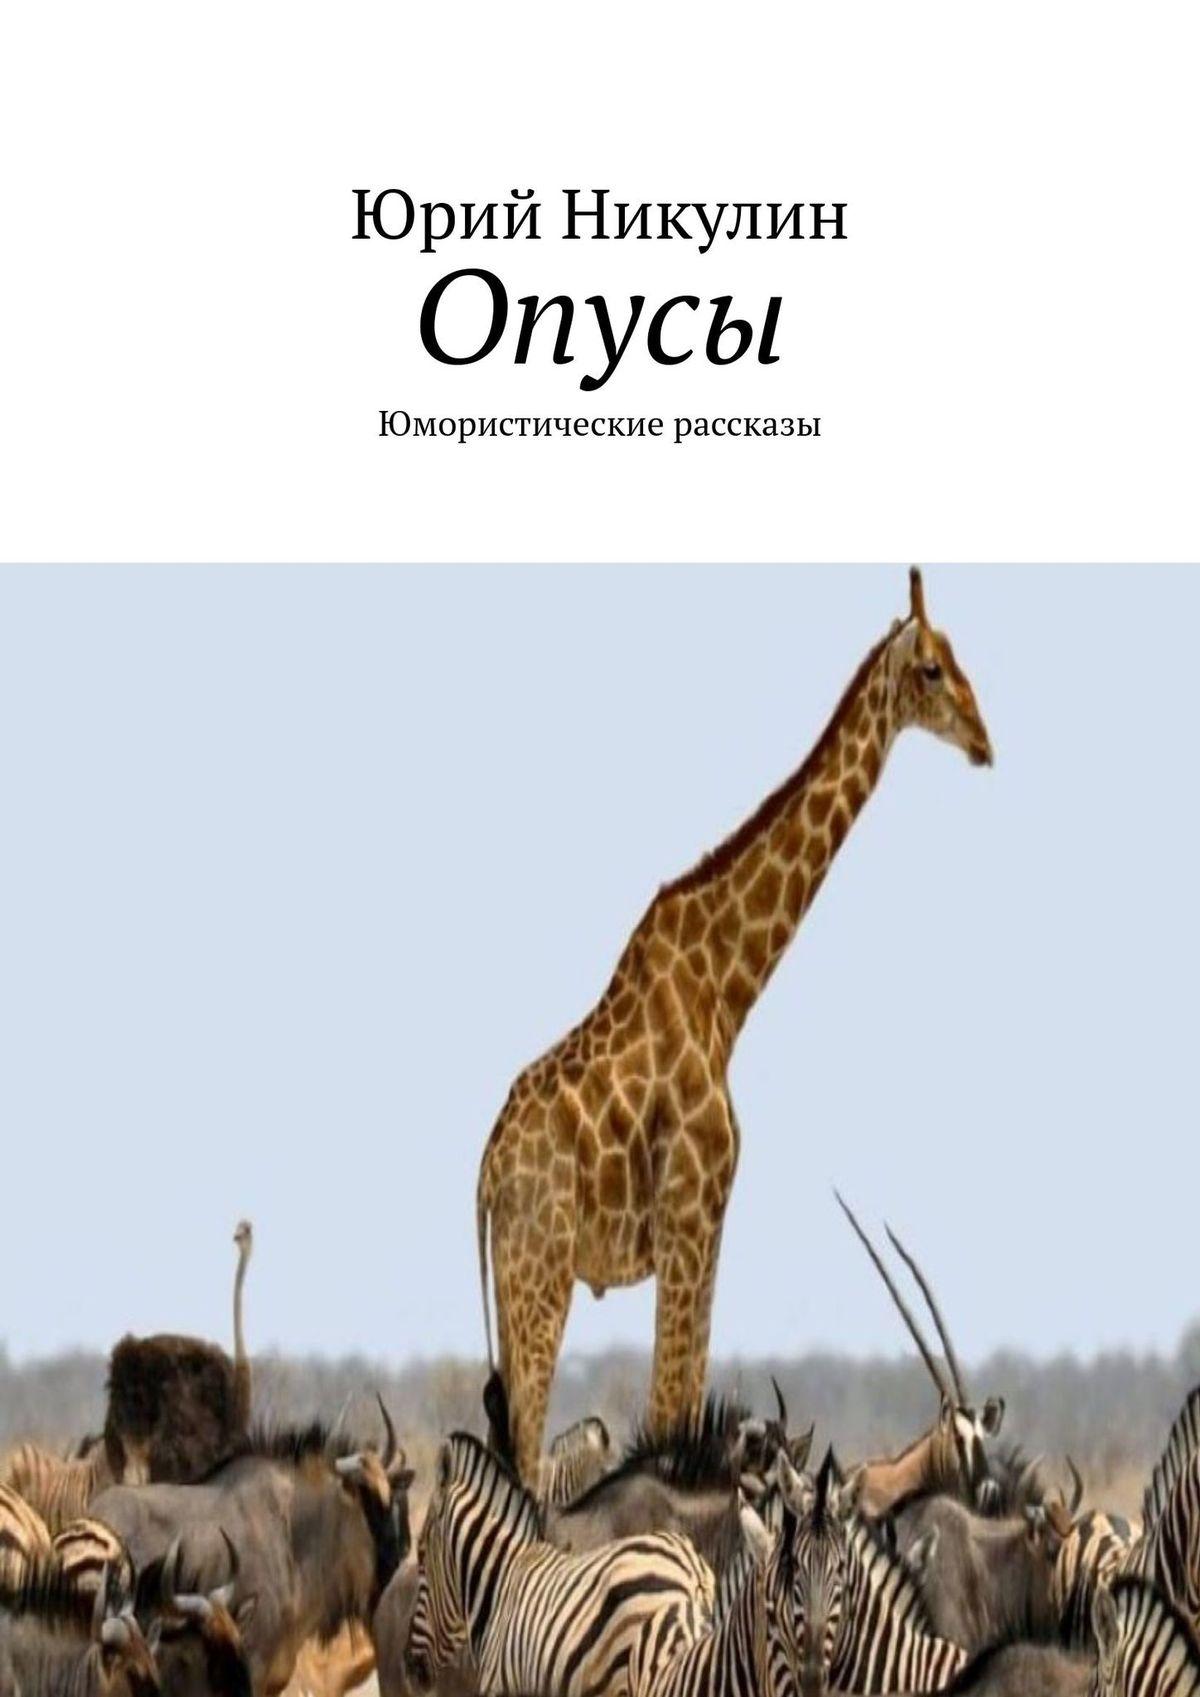 Юрий Никулин Опусы. Юмористические рассказы цена